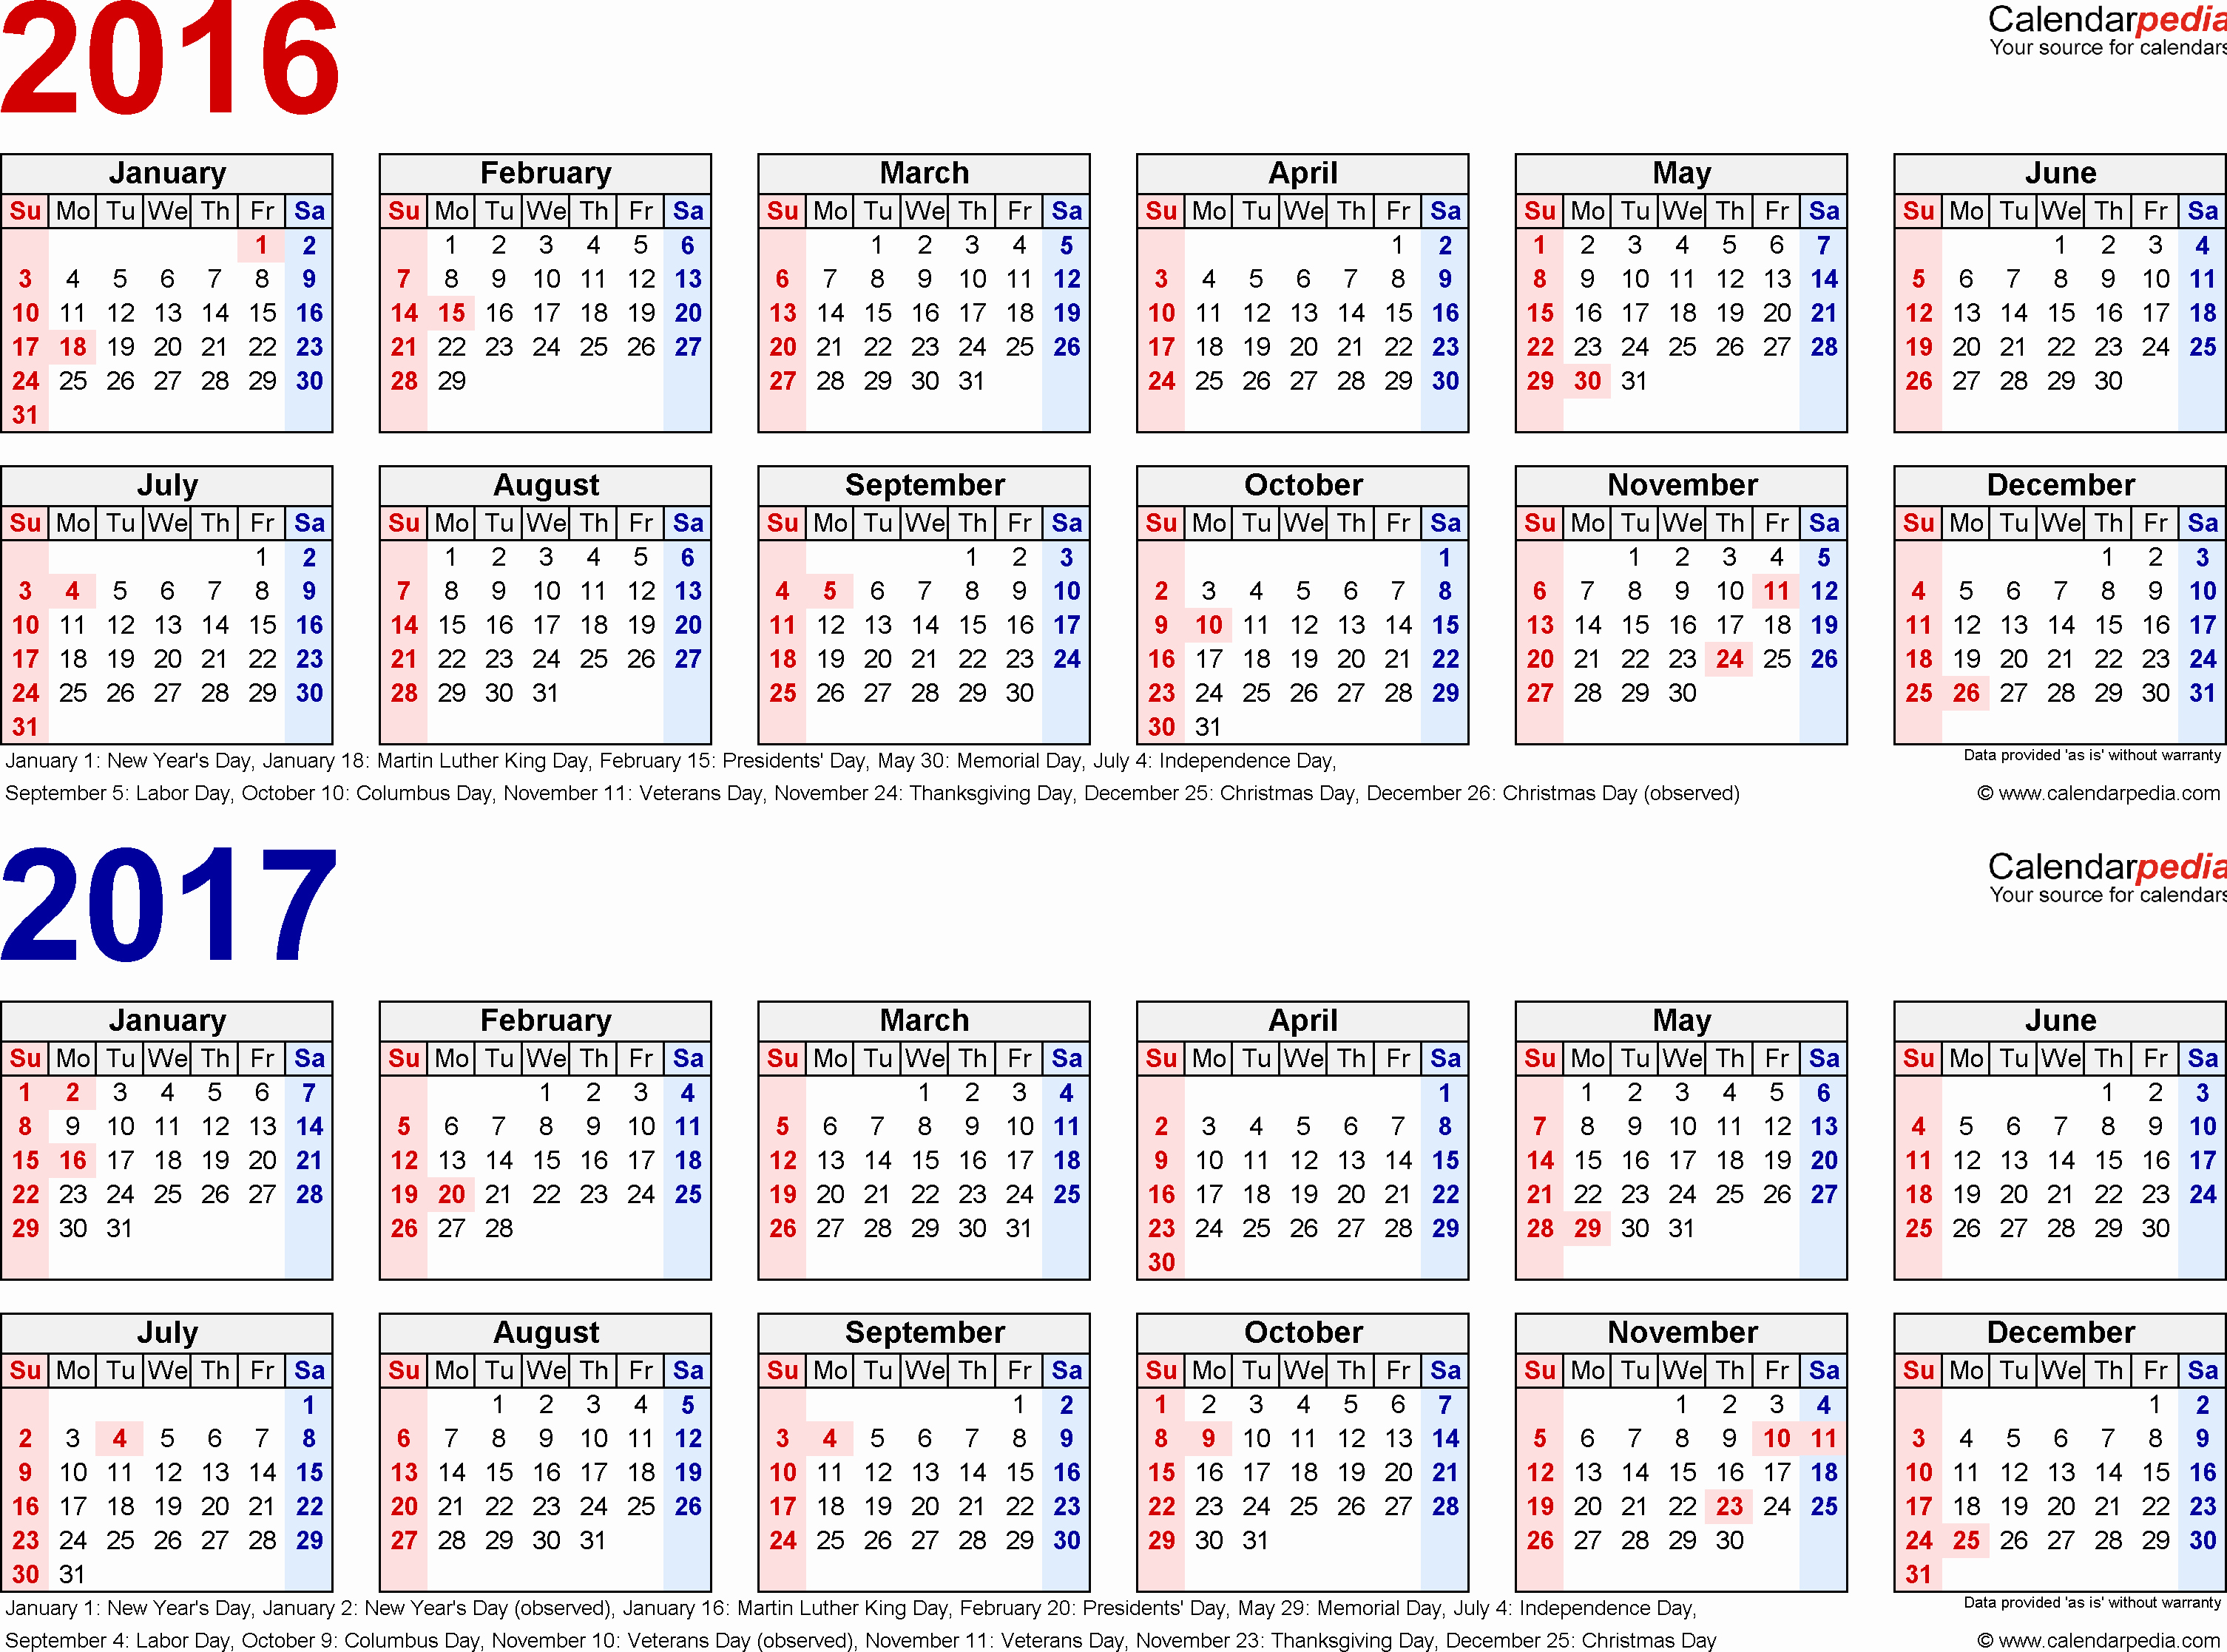 One Page Annual Calendar 2017 Elegant 2016 2017 Calendar Free Printable Two Year Excel Calendars